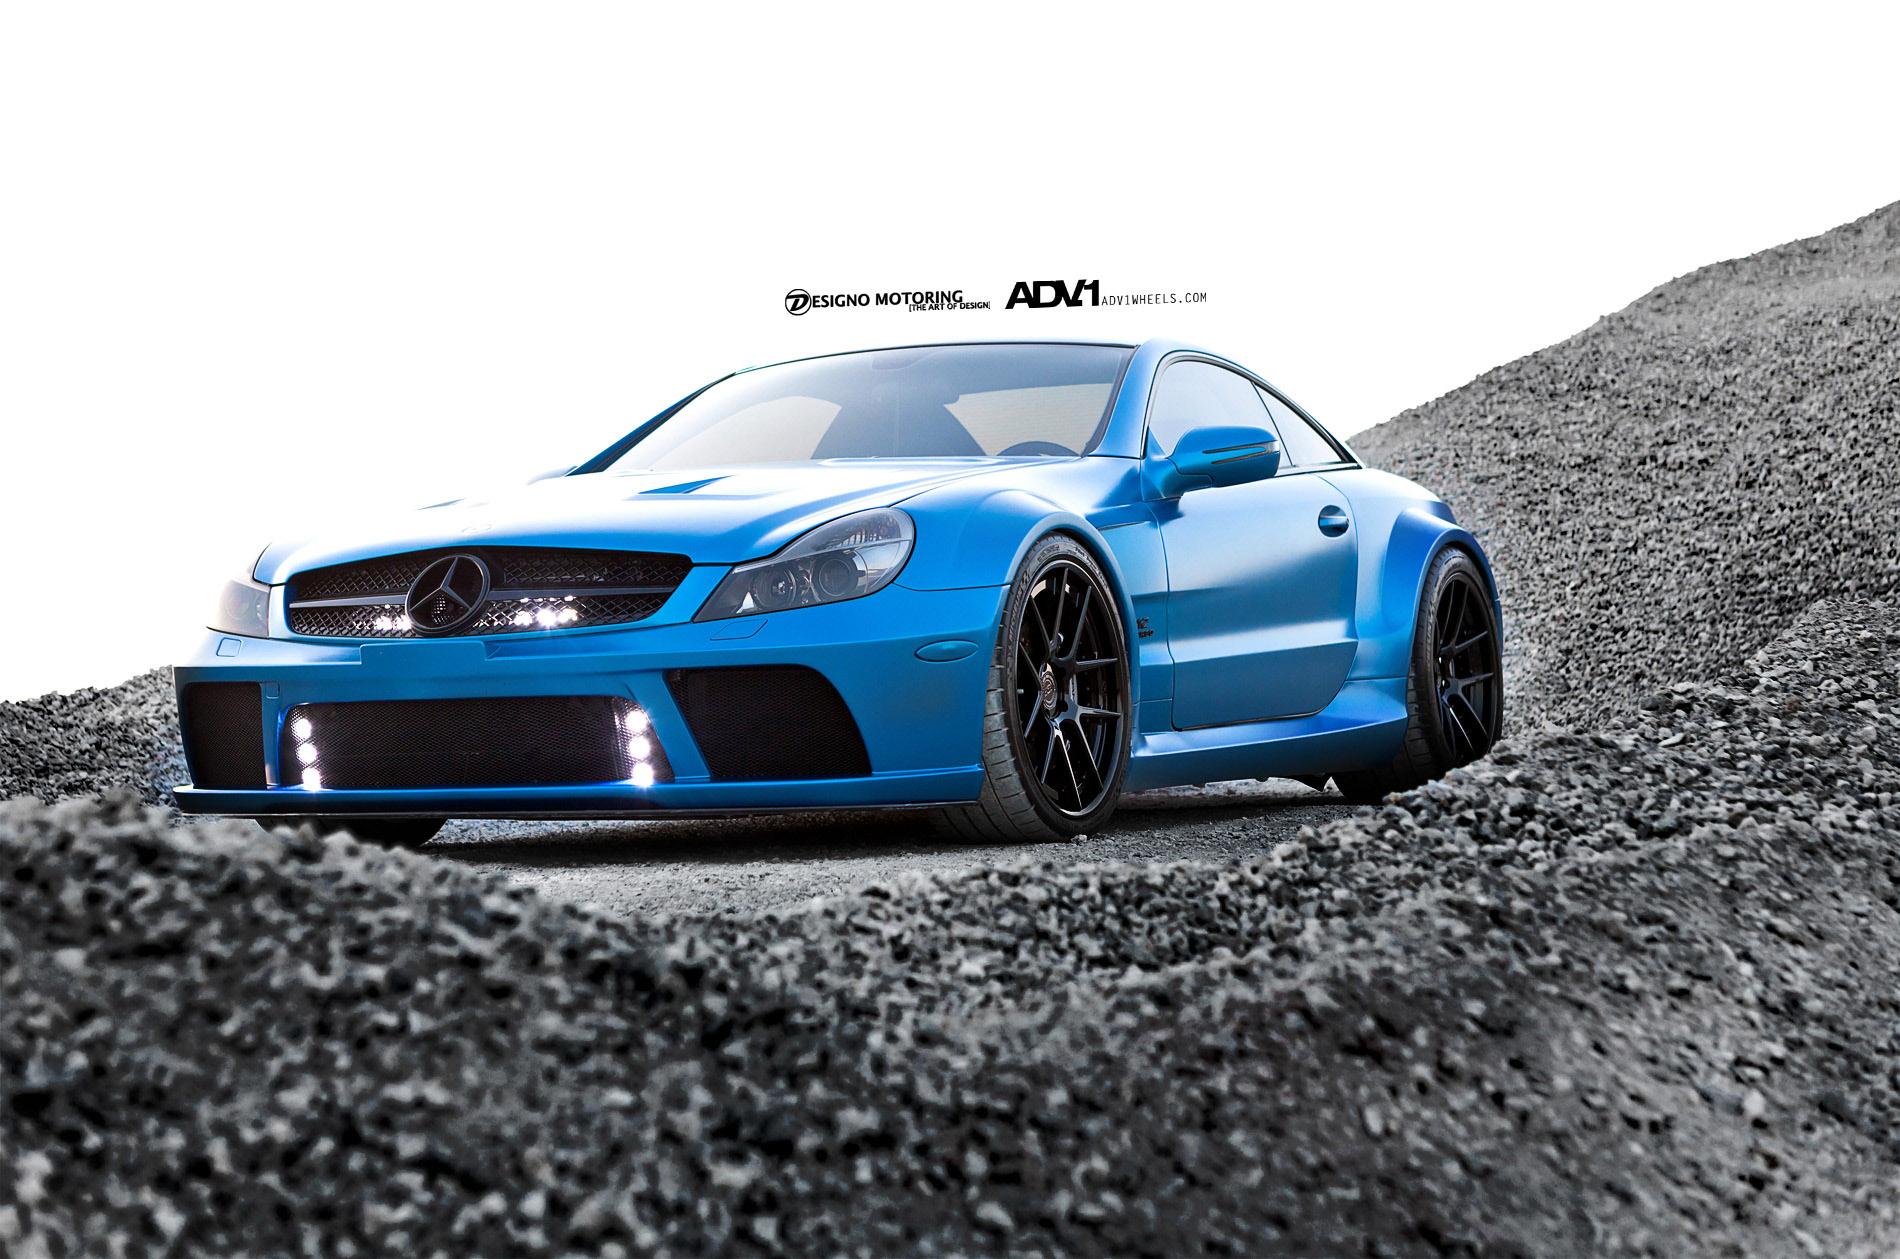 Mercedes sl 65 amg black series vs ferrari 458 italia video for Sl65 mercedes benz